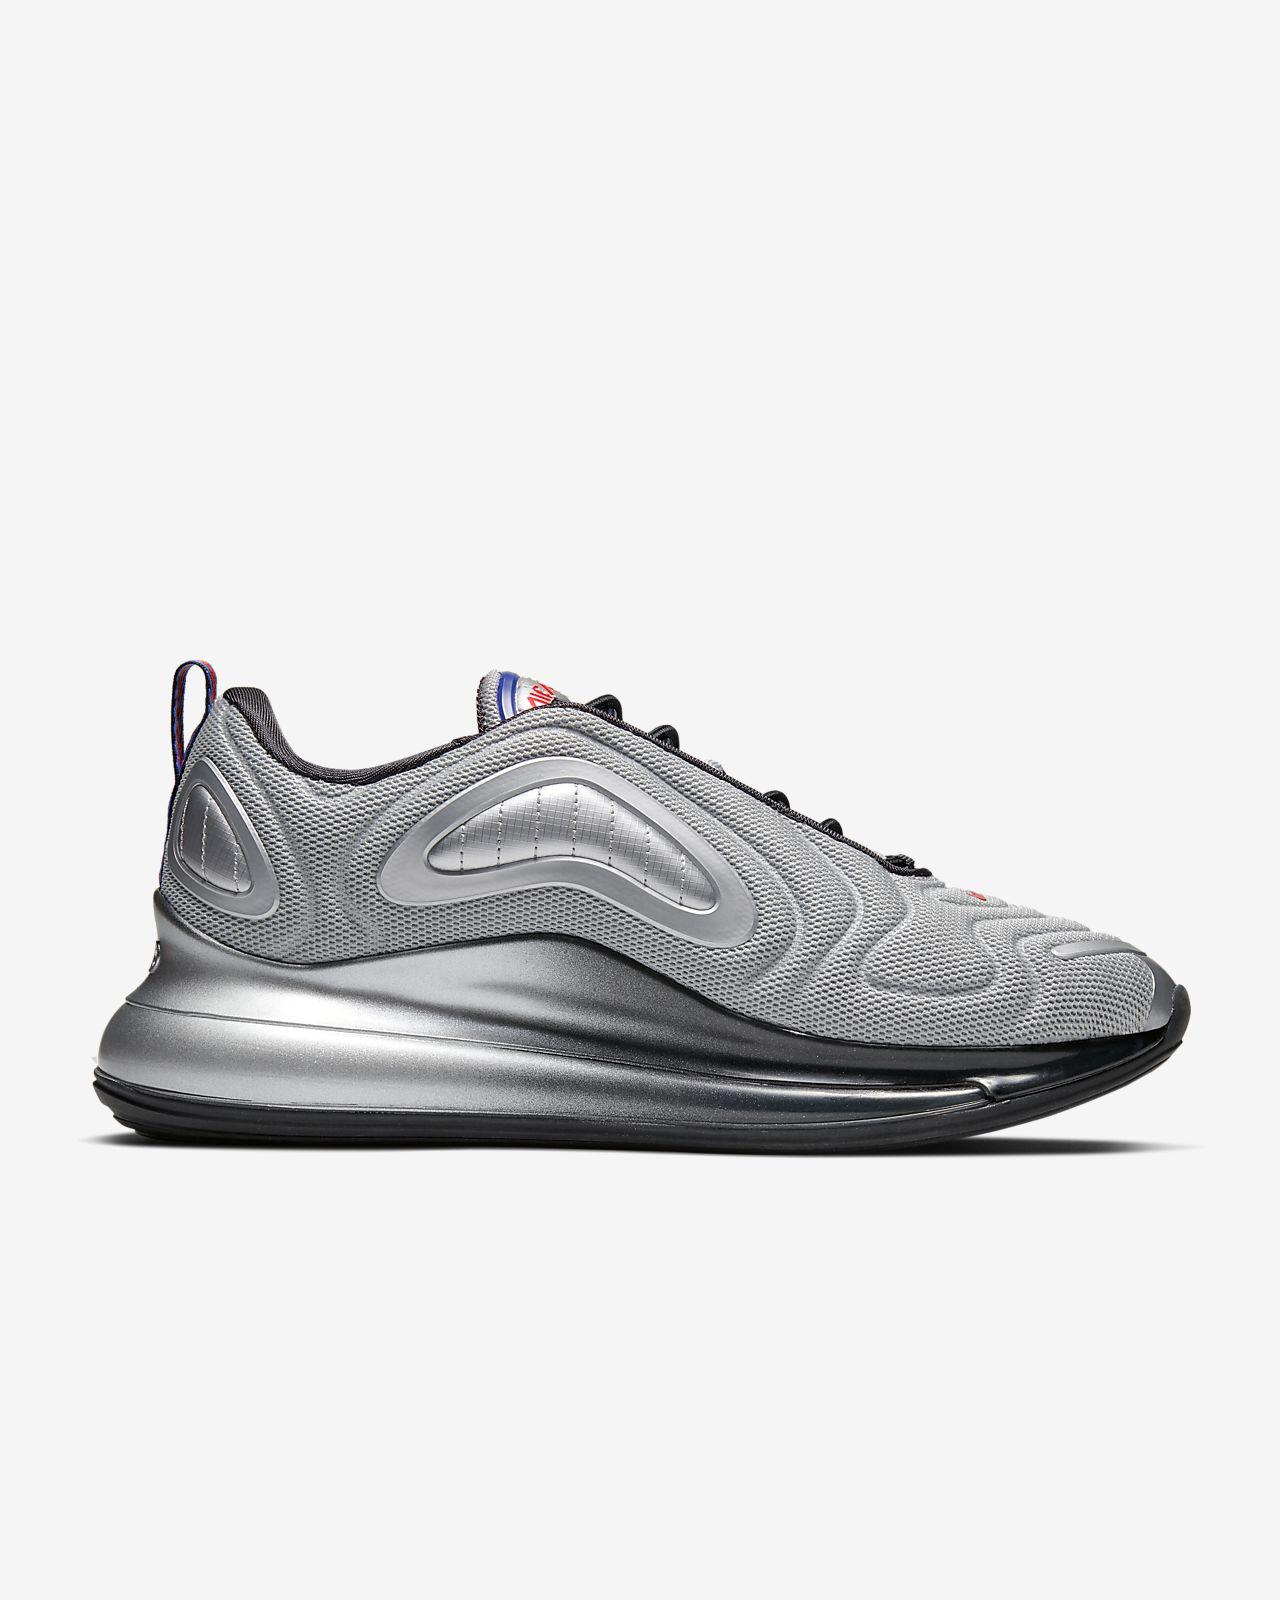 Nike, Jordan, Hurley Shoes For Sale Online Nike Air Max